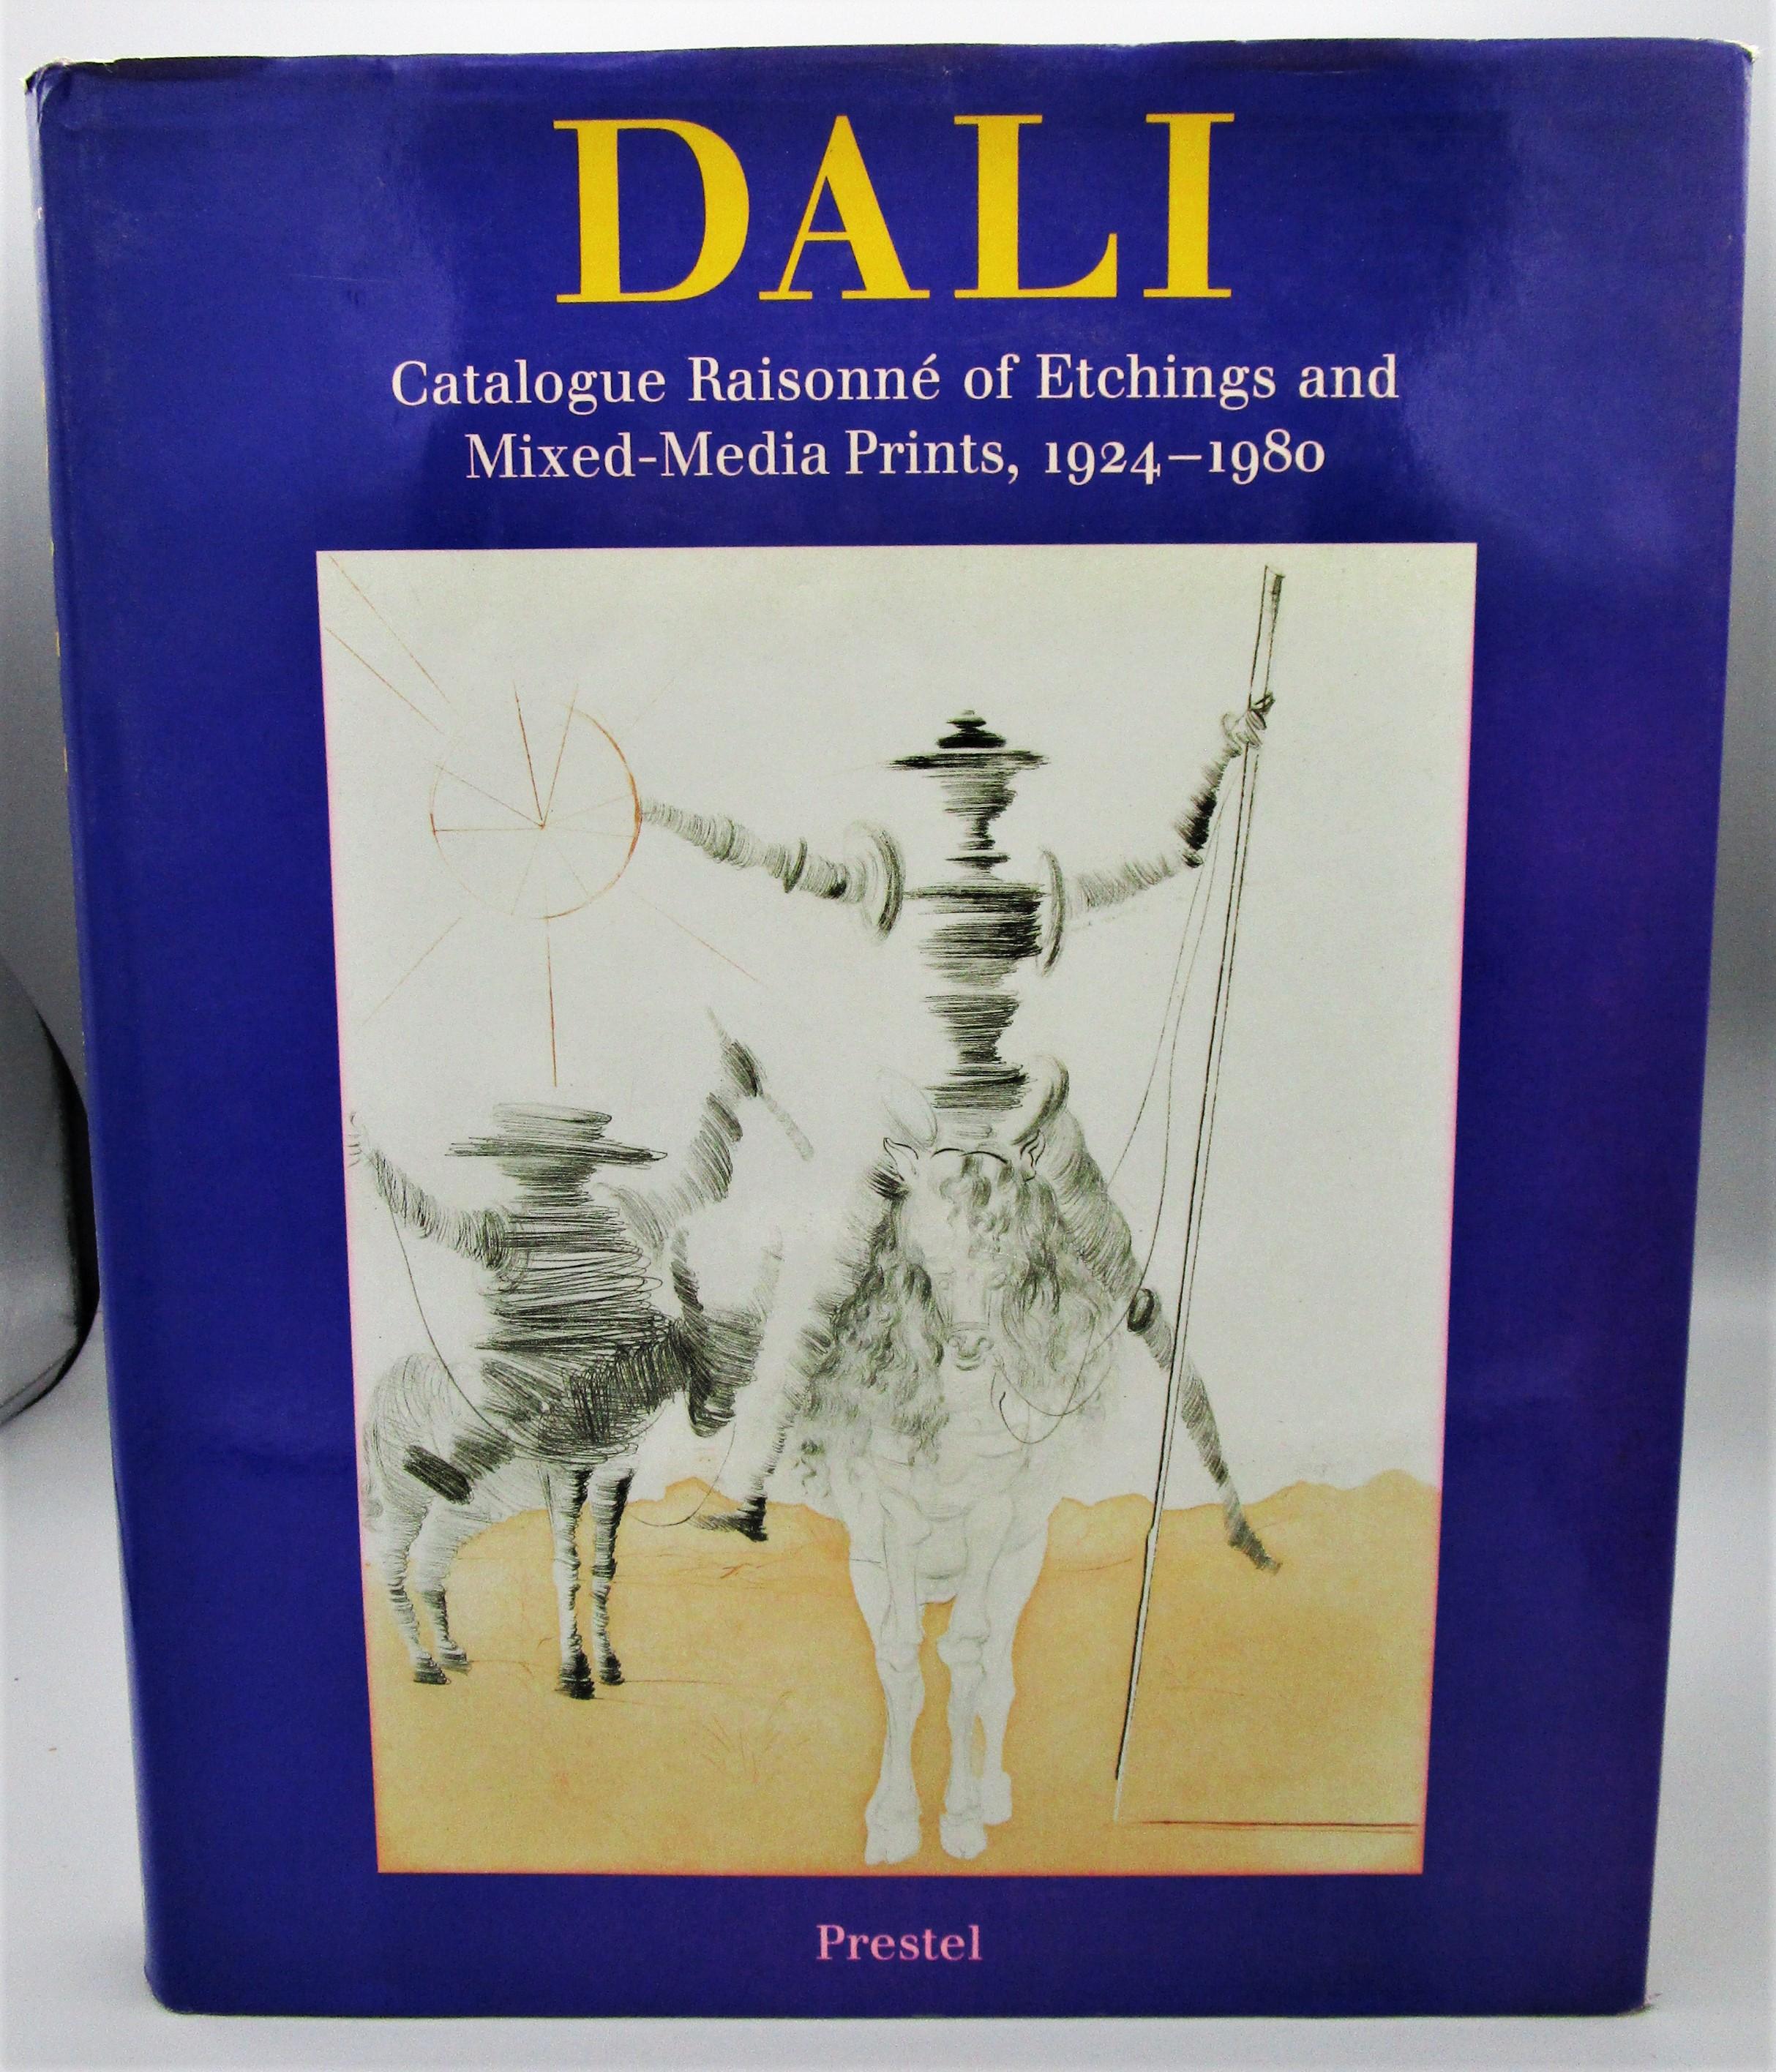 DALI: CATALOGUE RAISONNE OF ETCHINGS & MIXED-MEDIA PRINTS 1924-1980